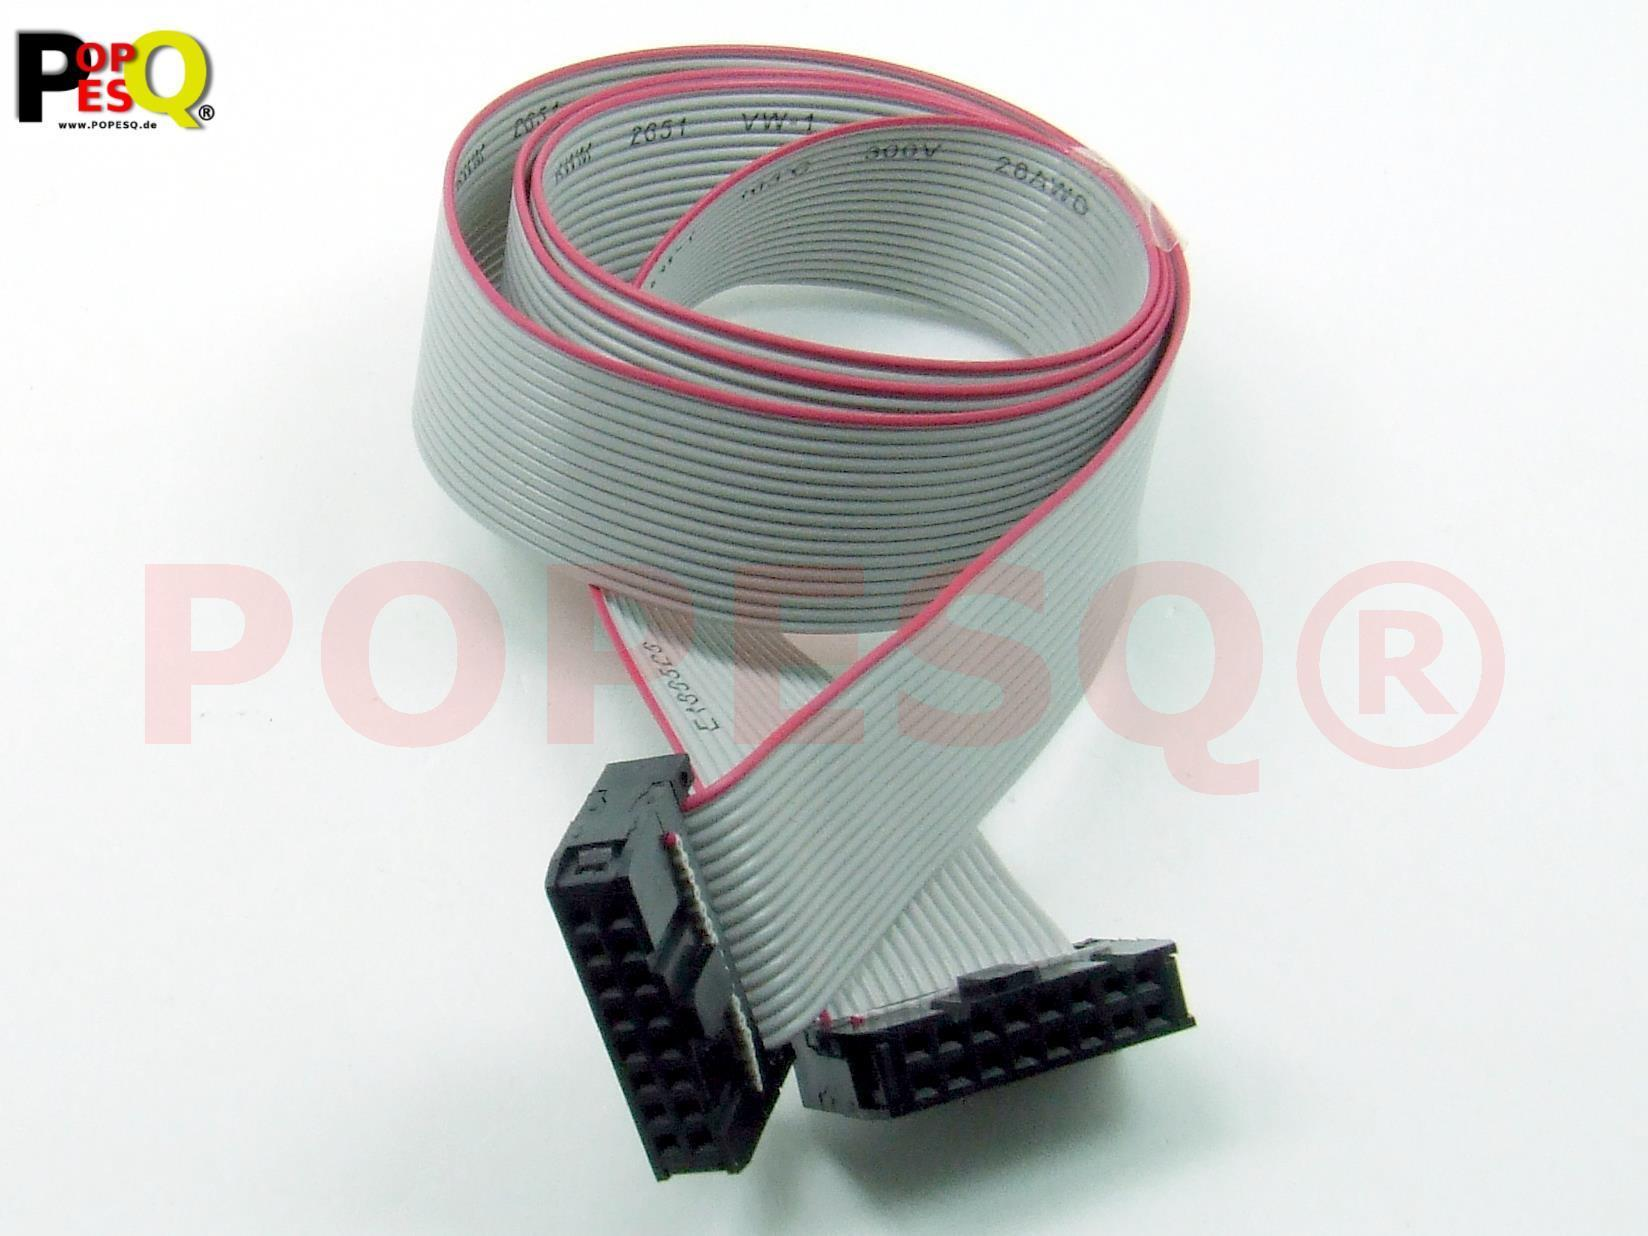 1 Stk x IDC Kabel 16 polig 50cm 2.54mm Verbinder Flachbandkabel #A1316